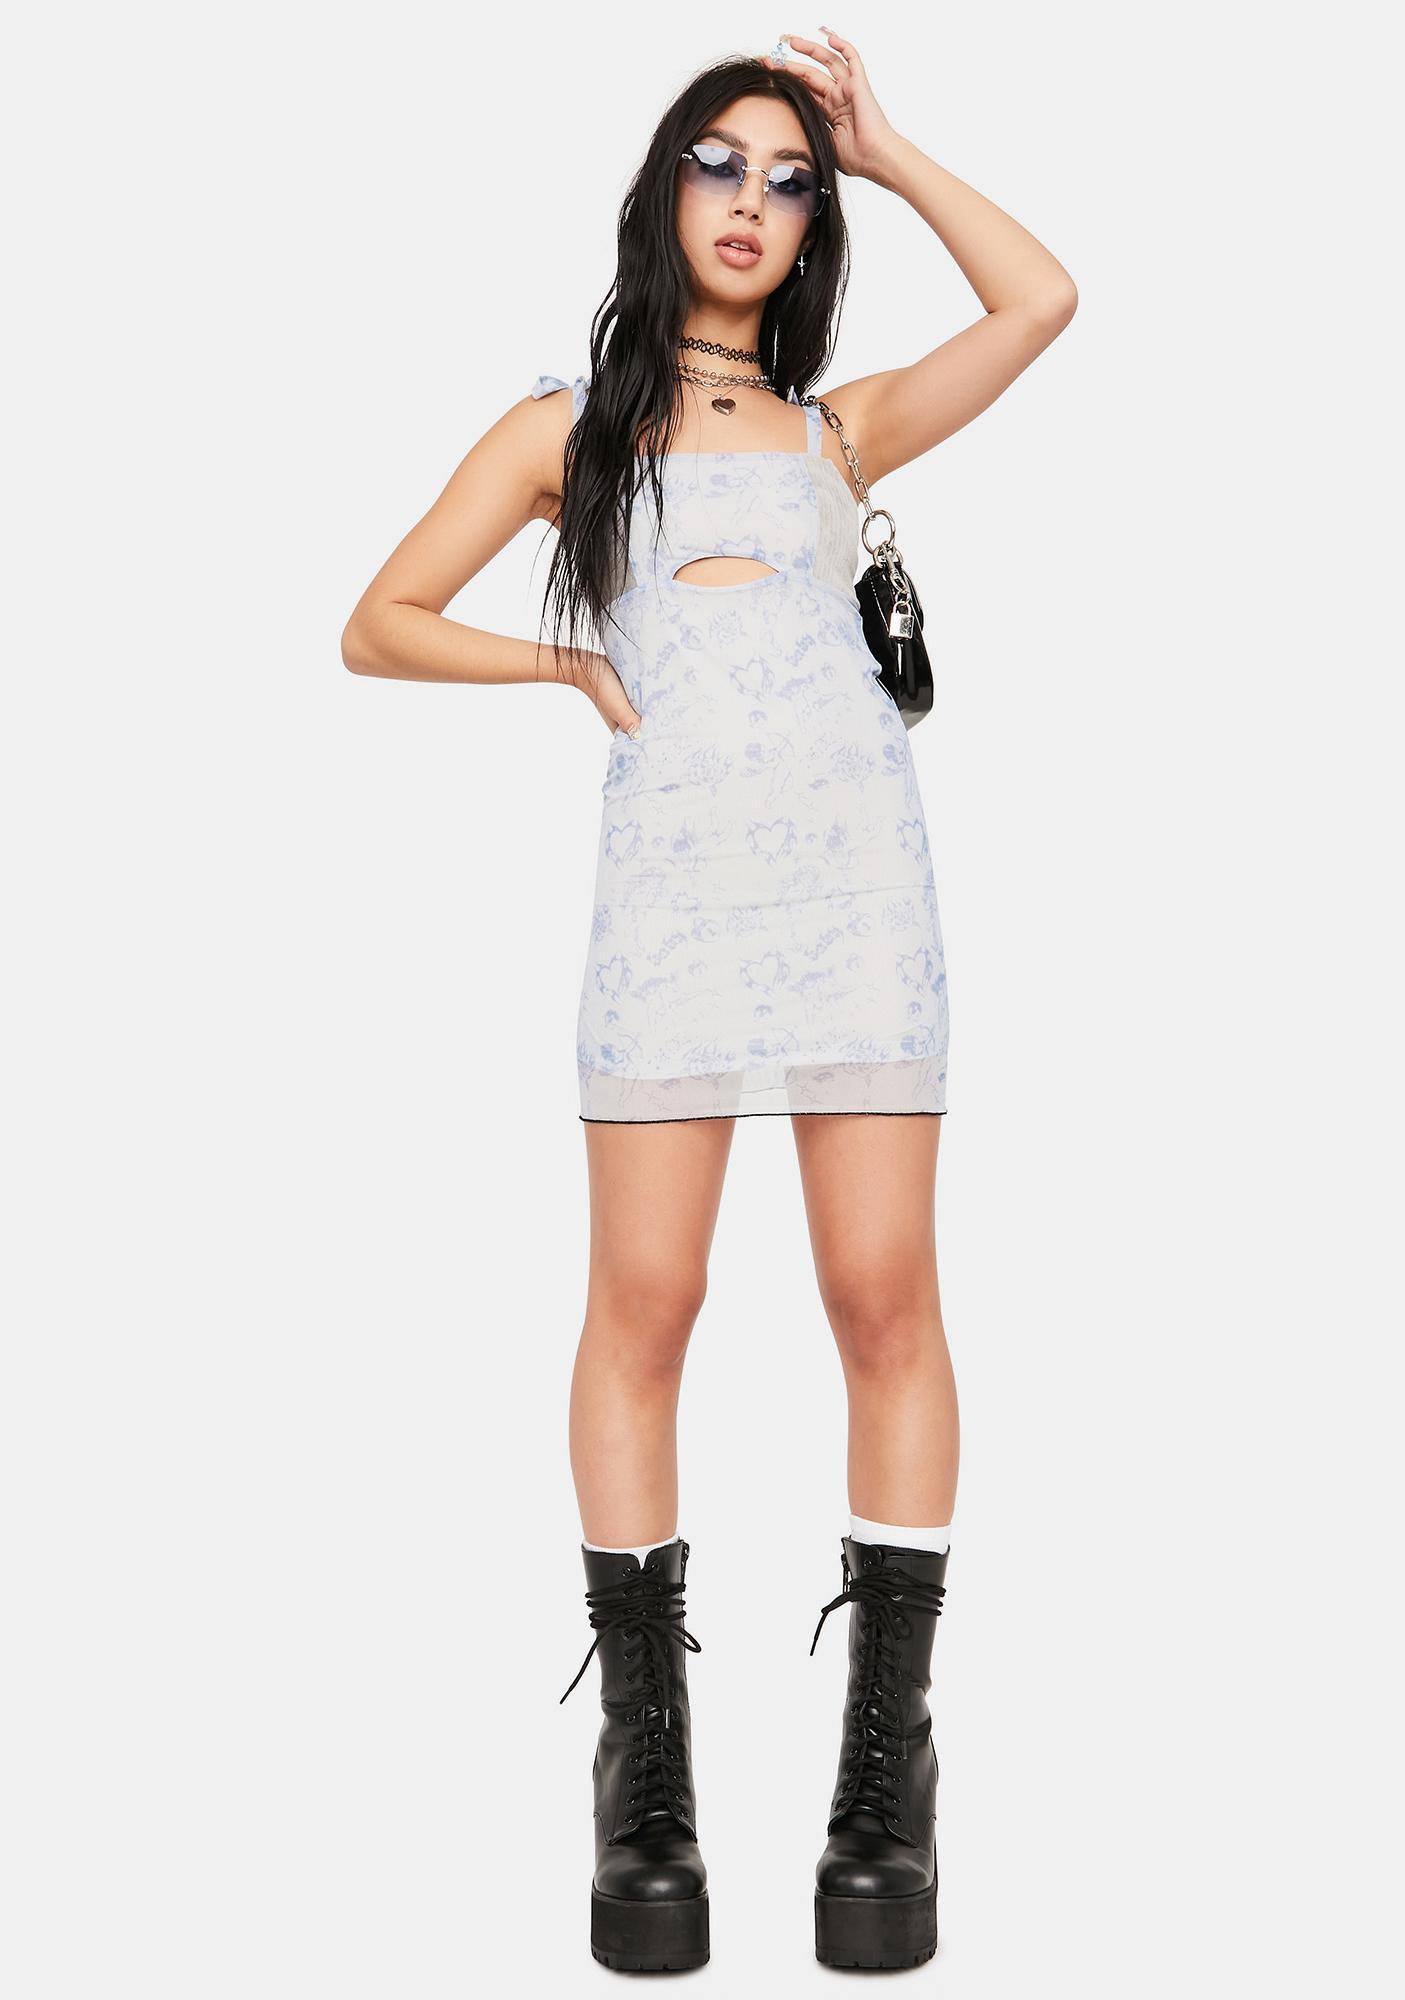 ZEMETA Cupid Love Mesh Mini Dress